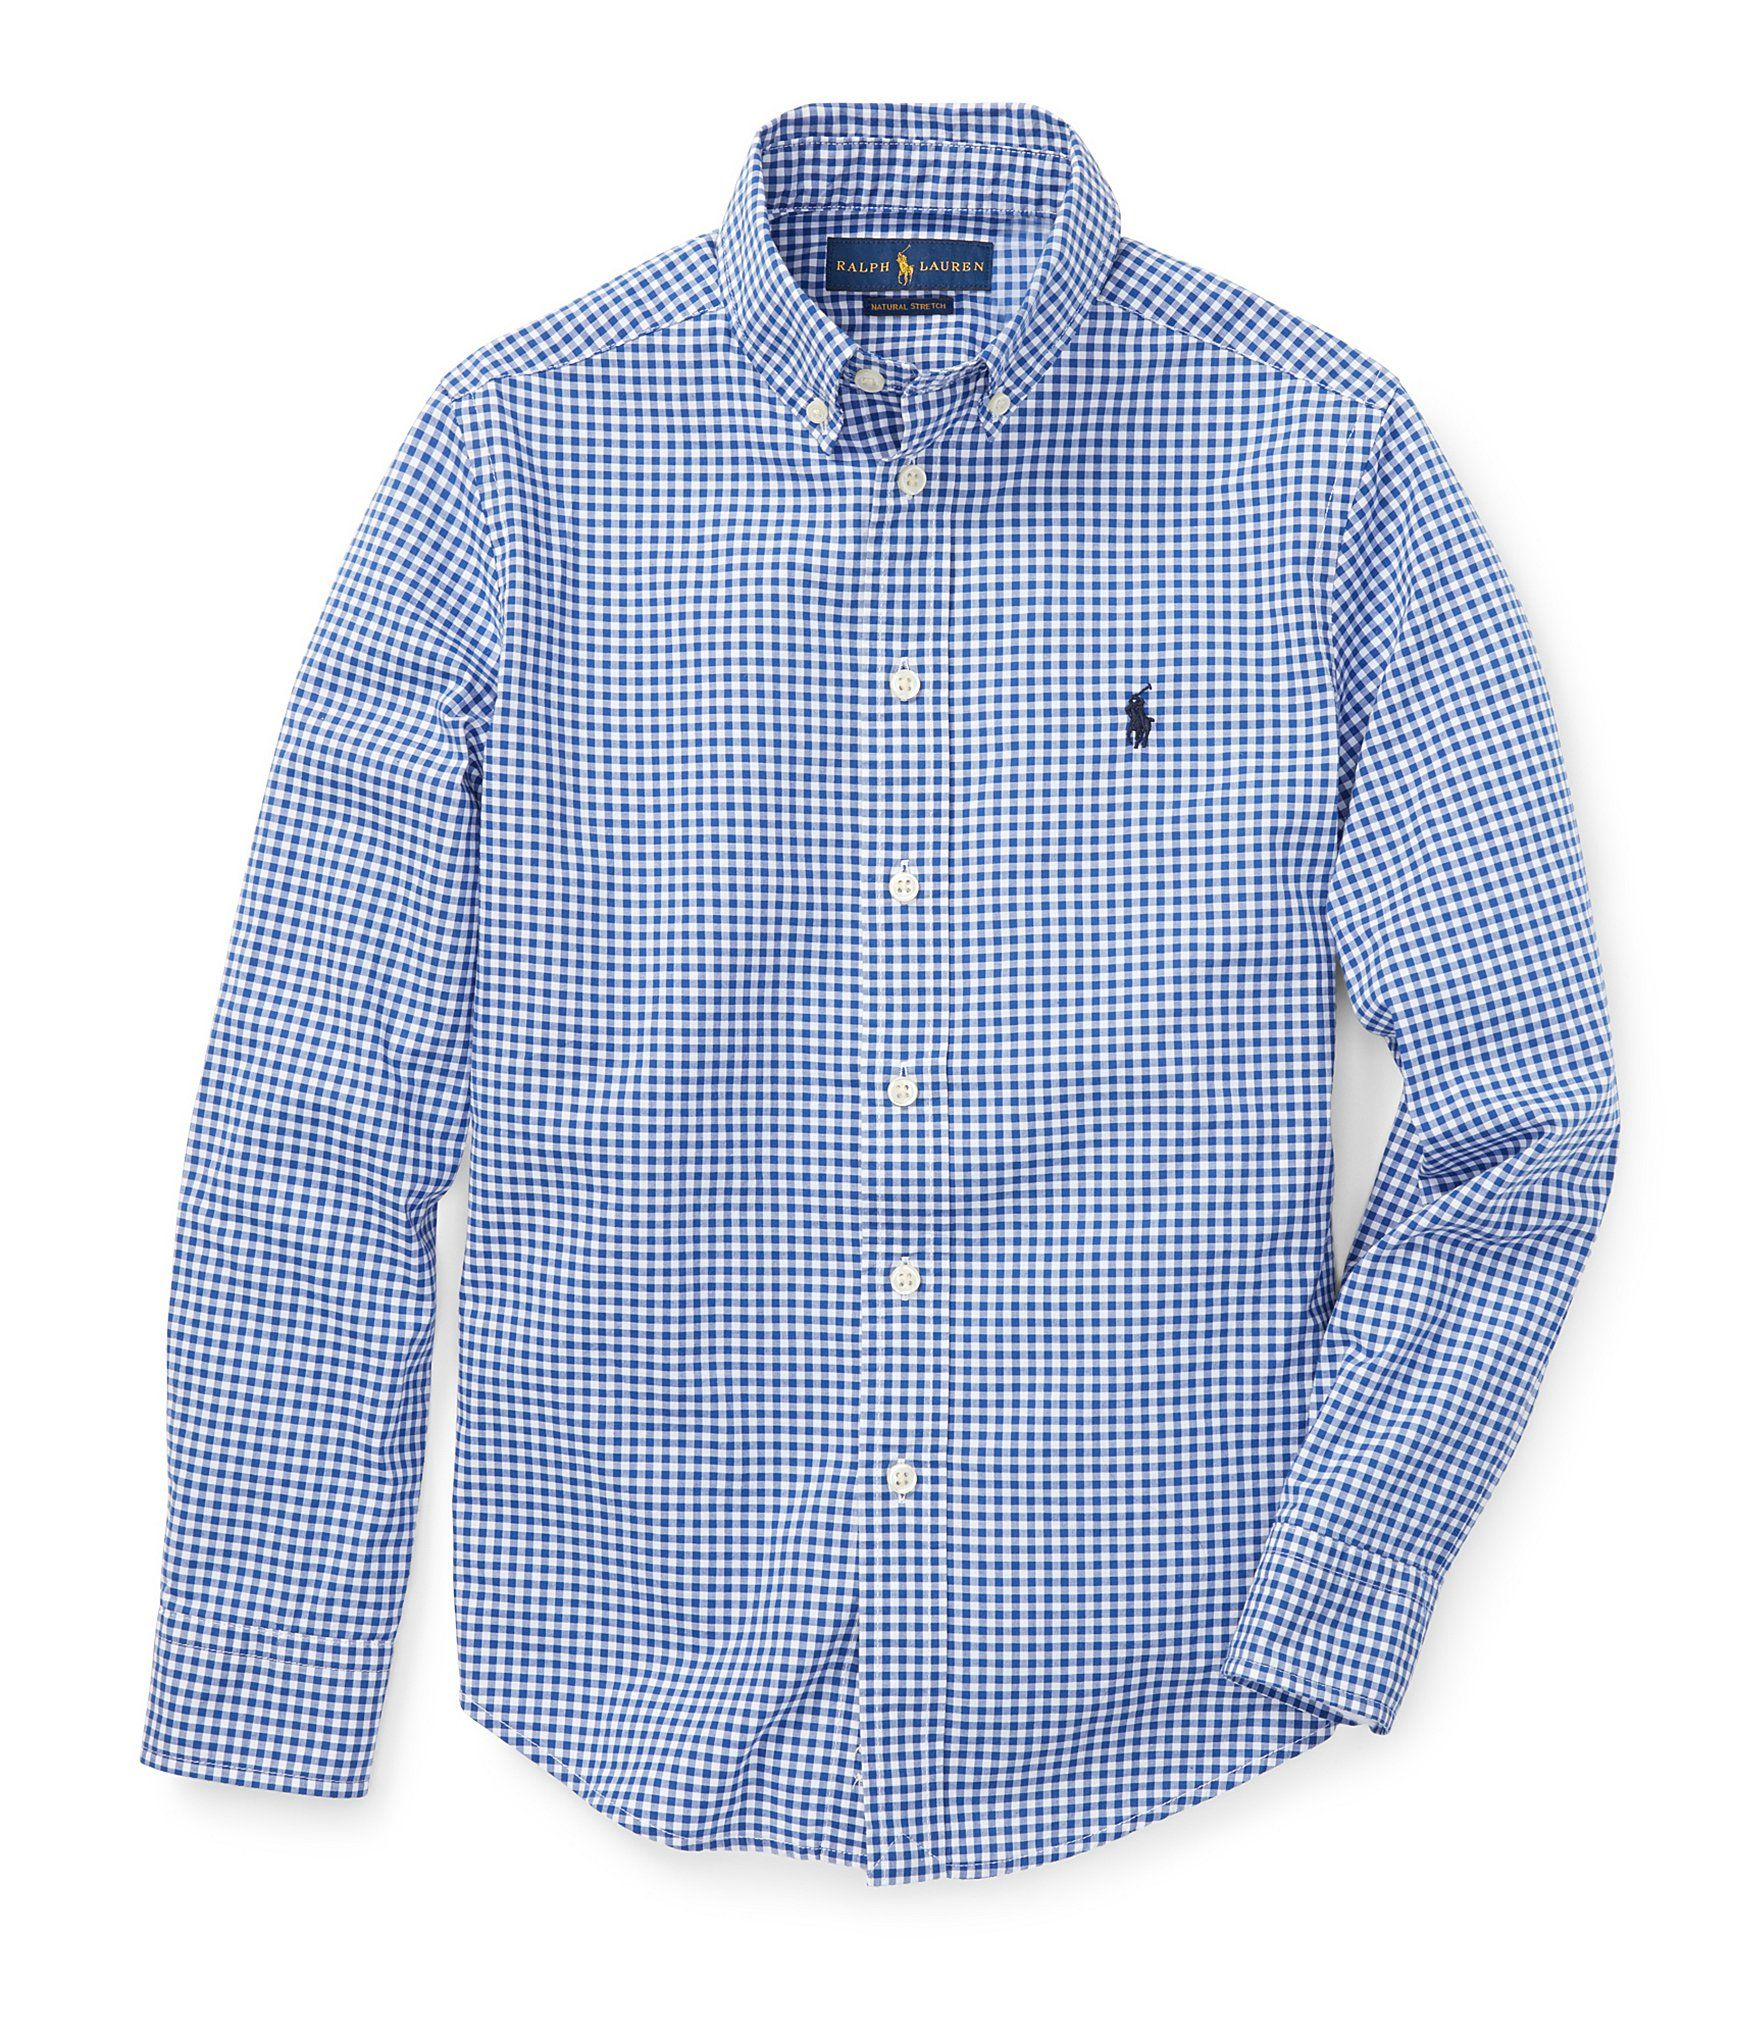 RALPH LAUREN Boys Checked Long Sleeve Shirt Green Multi